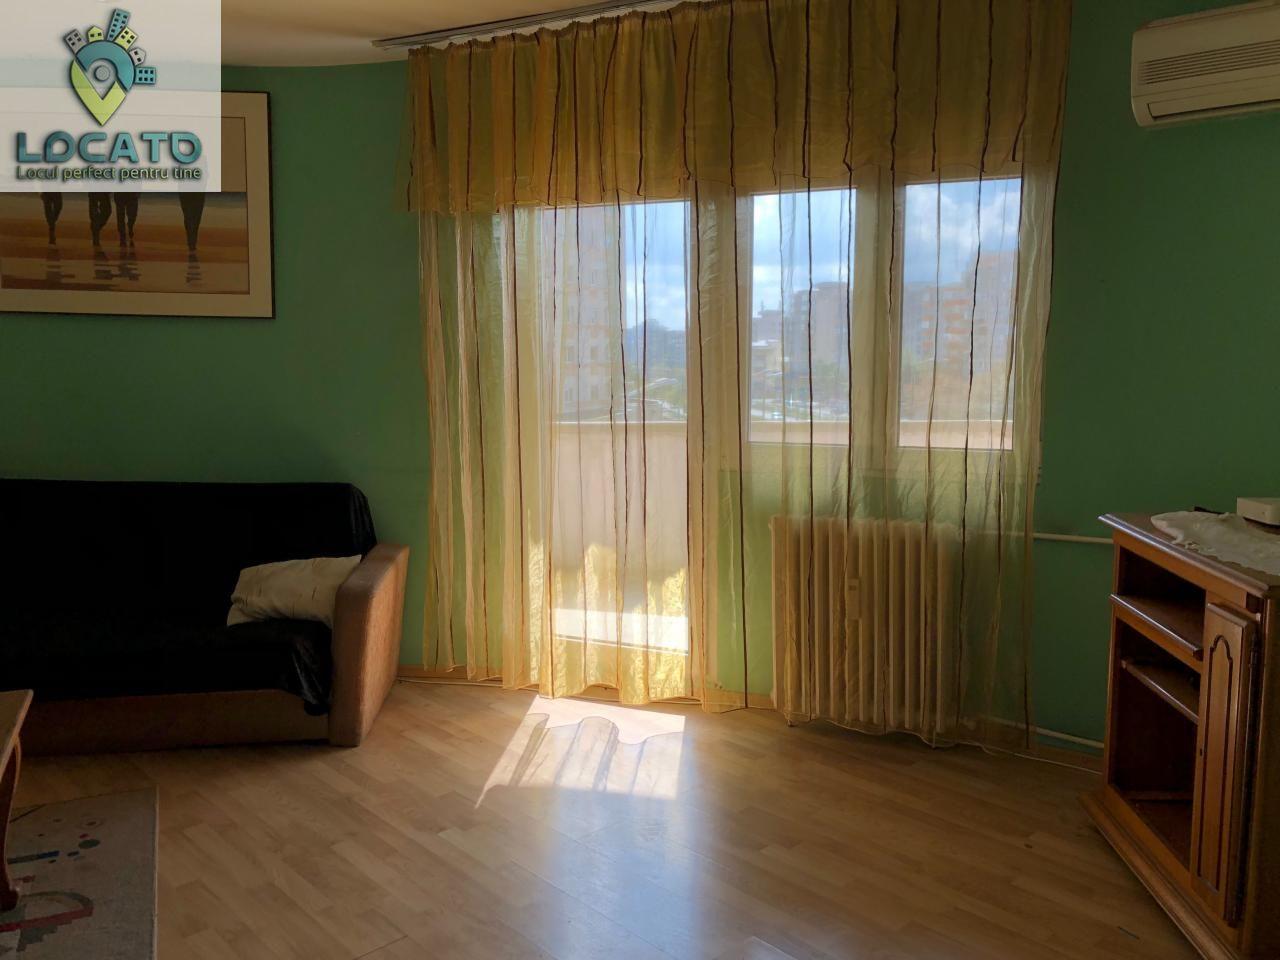 Apartament de vanzare, Ploiesti, Prahova, P-ta Mihai Viteazu - Foto 2